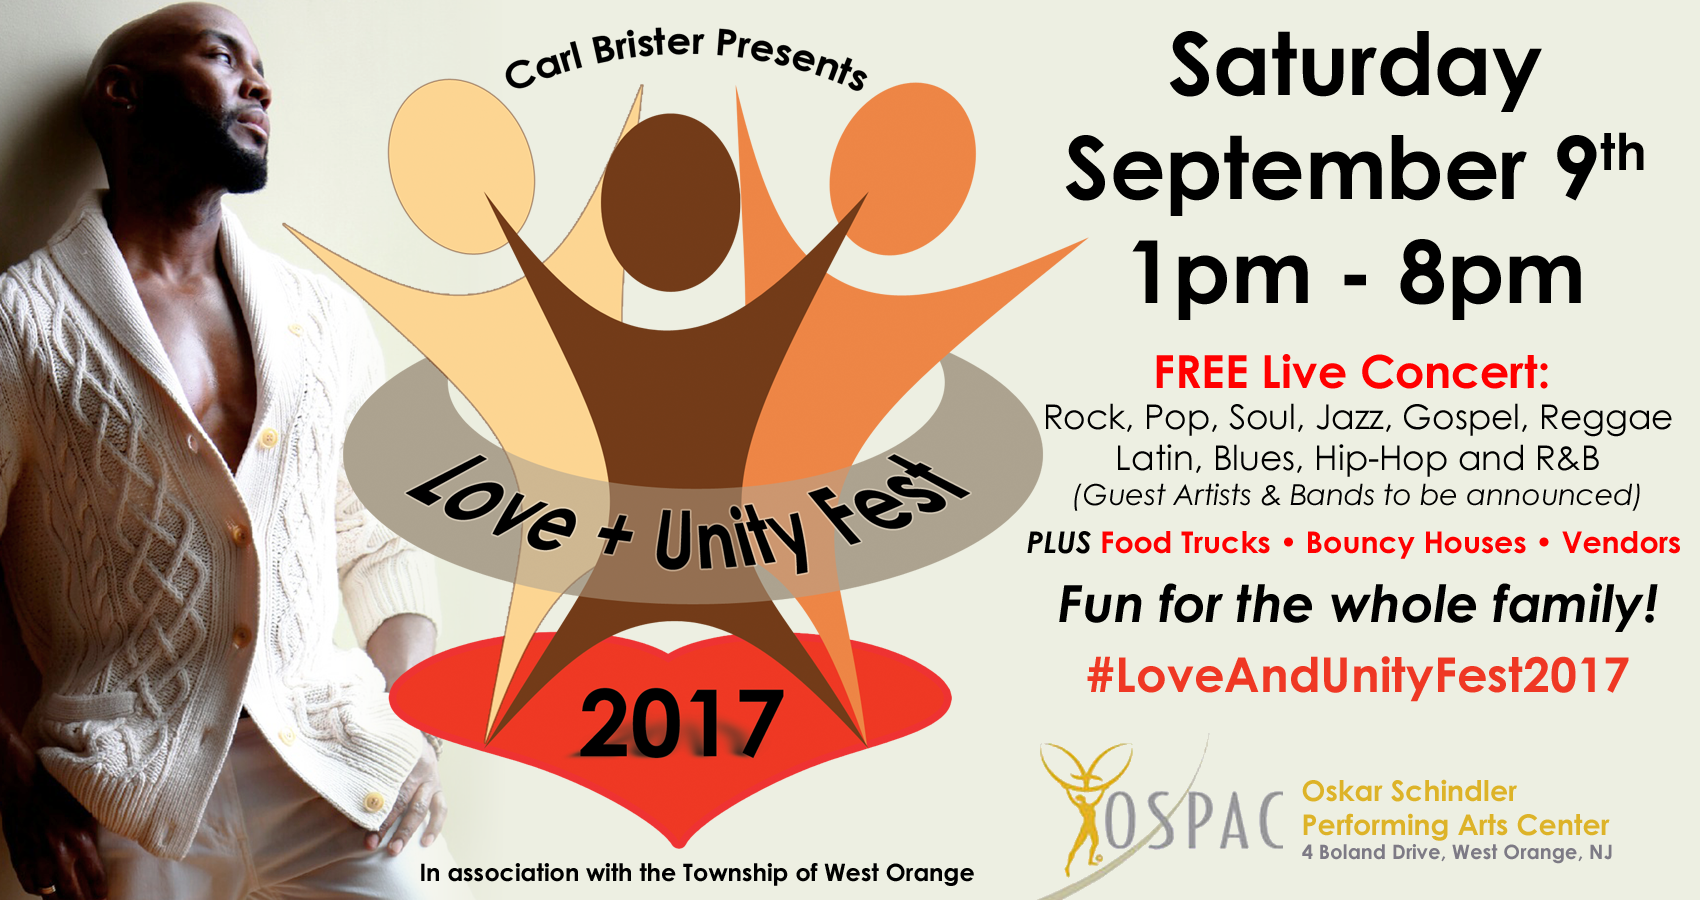 Love+Unity Fest 2017